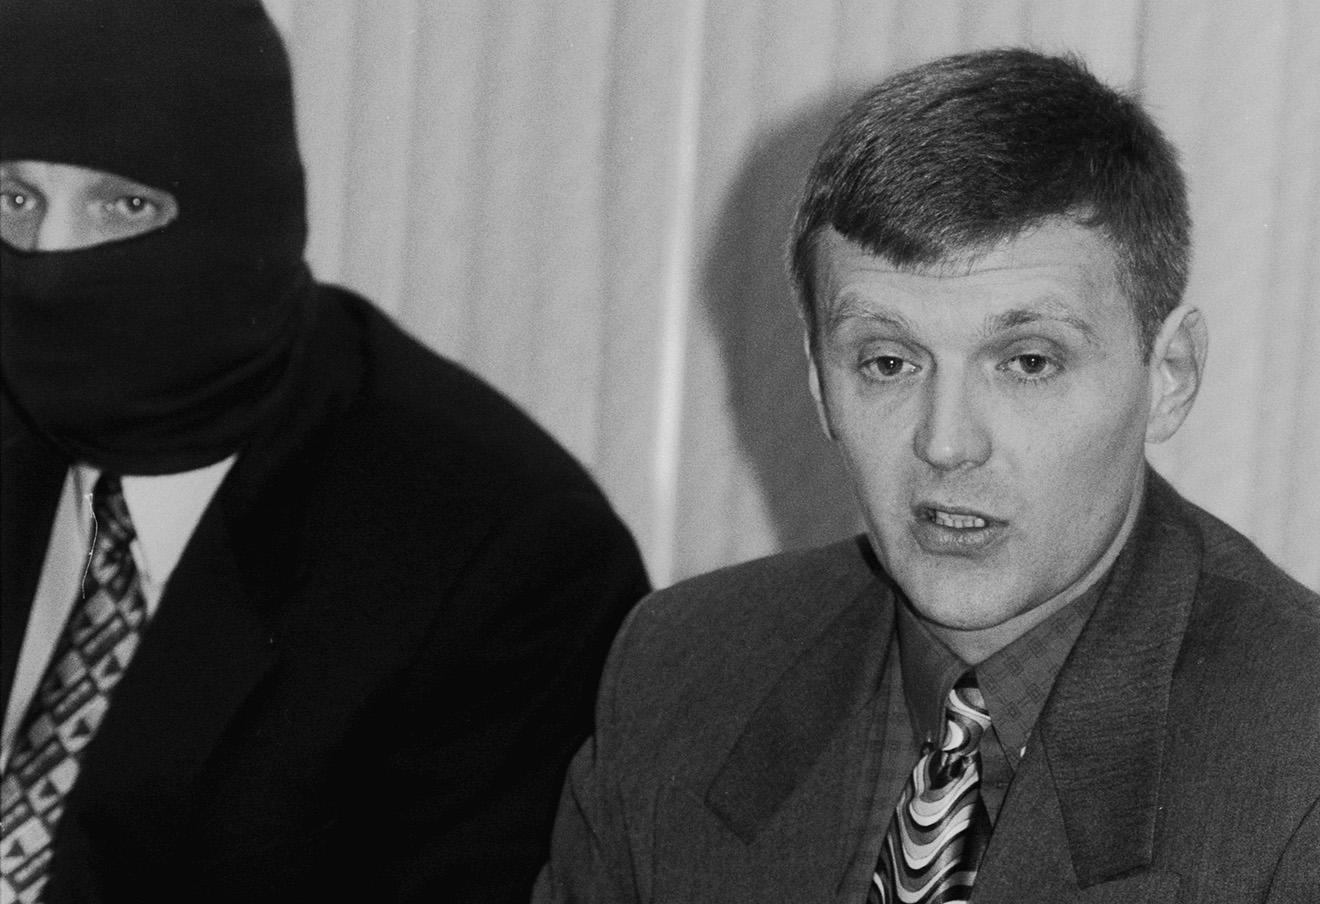 Александр Литвиненко (справа) на пресс-конференции, ноябрь 1998 года.